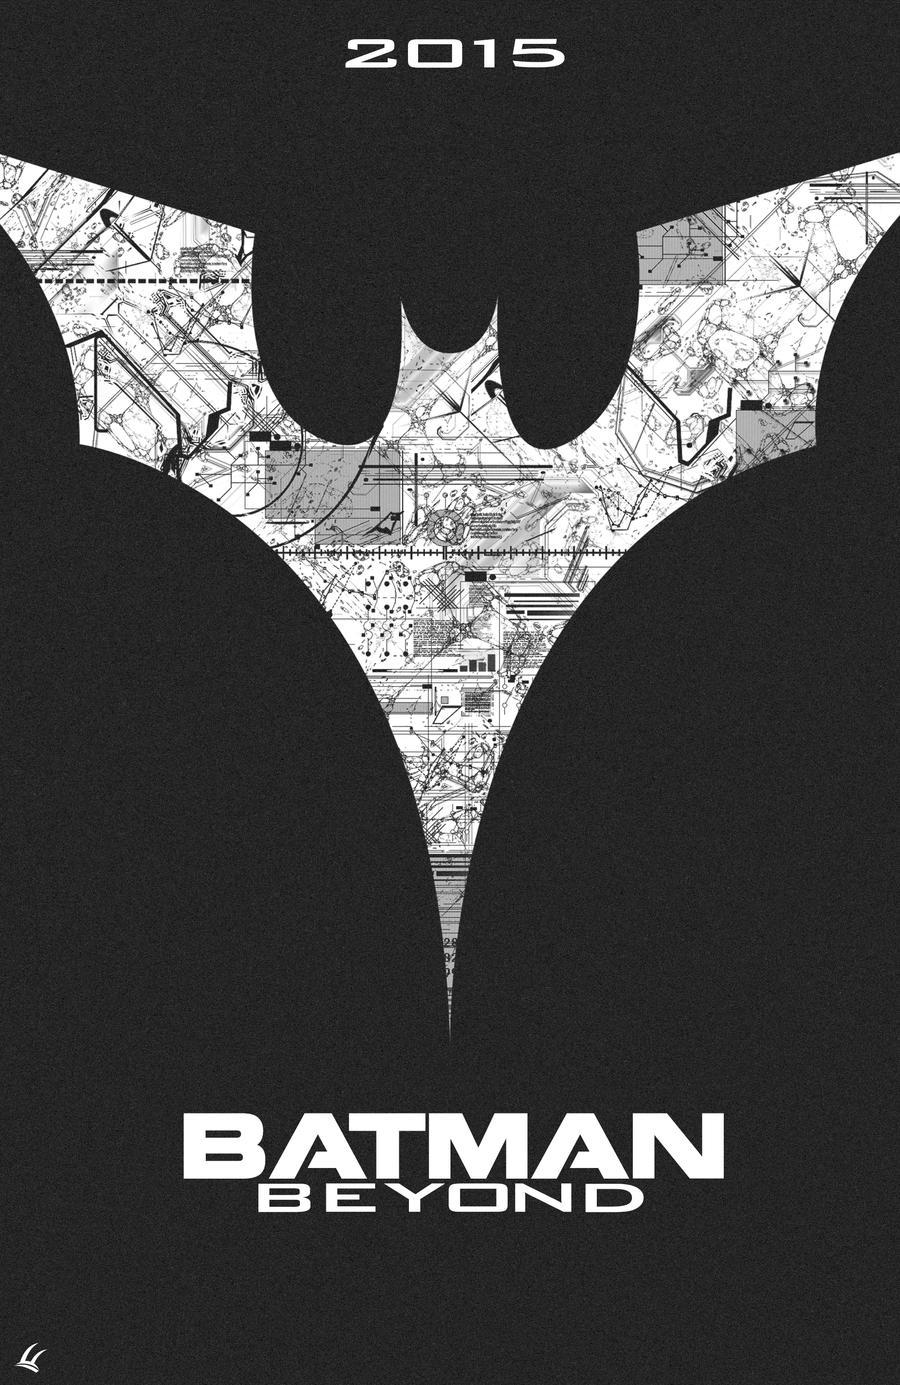 Batman Beyond Poster 2 By Universaldiablo On Deviantart